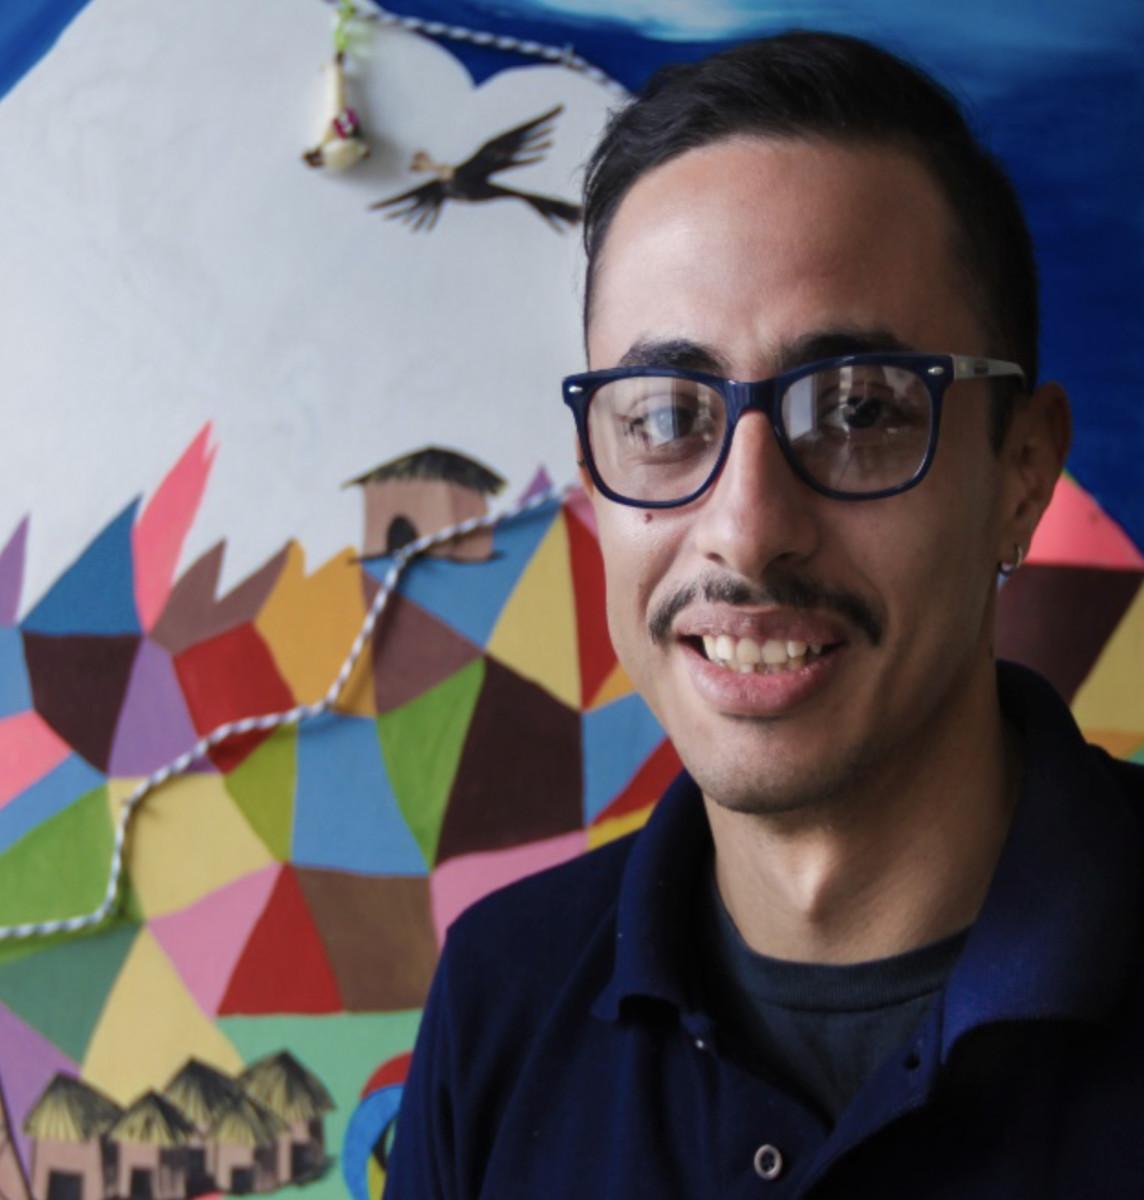 Global Glimpse Team - Camilo Maldonado